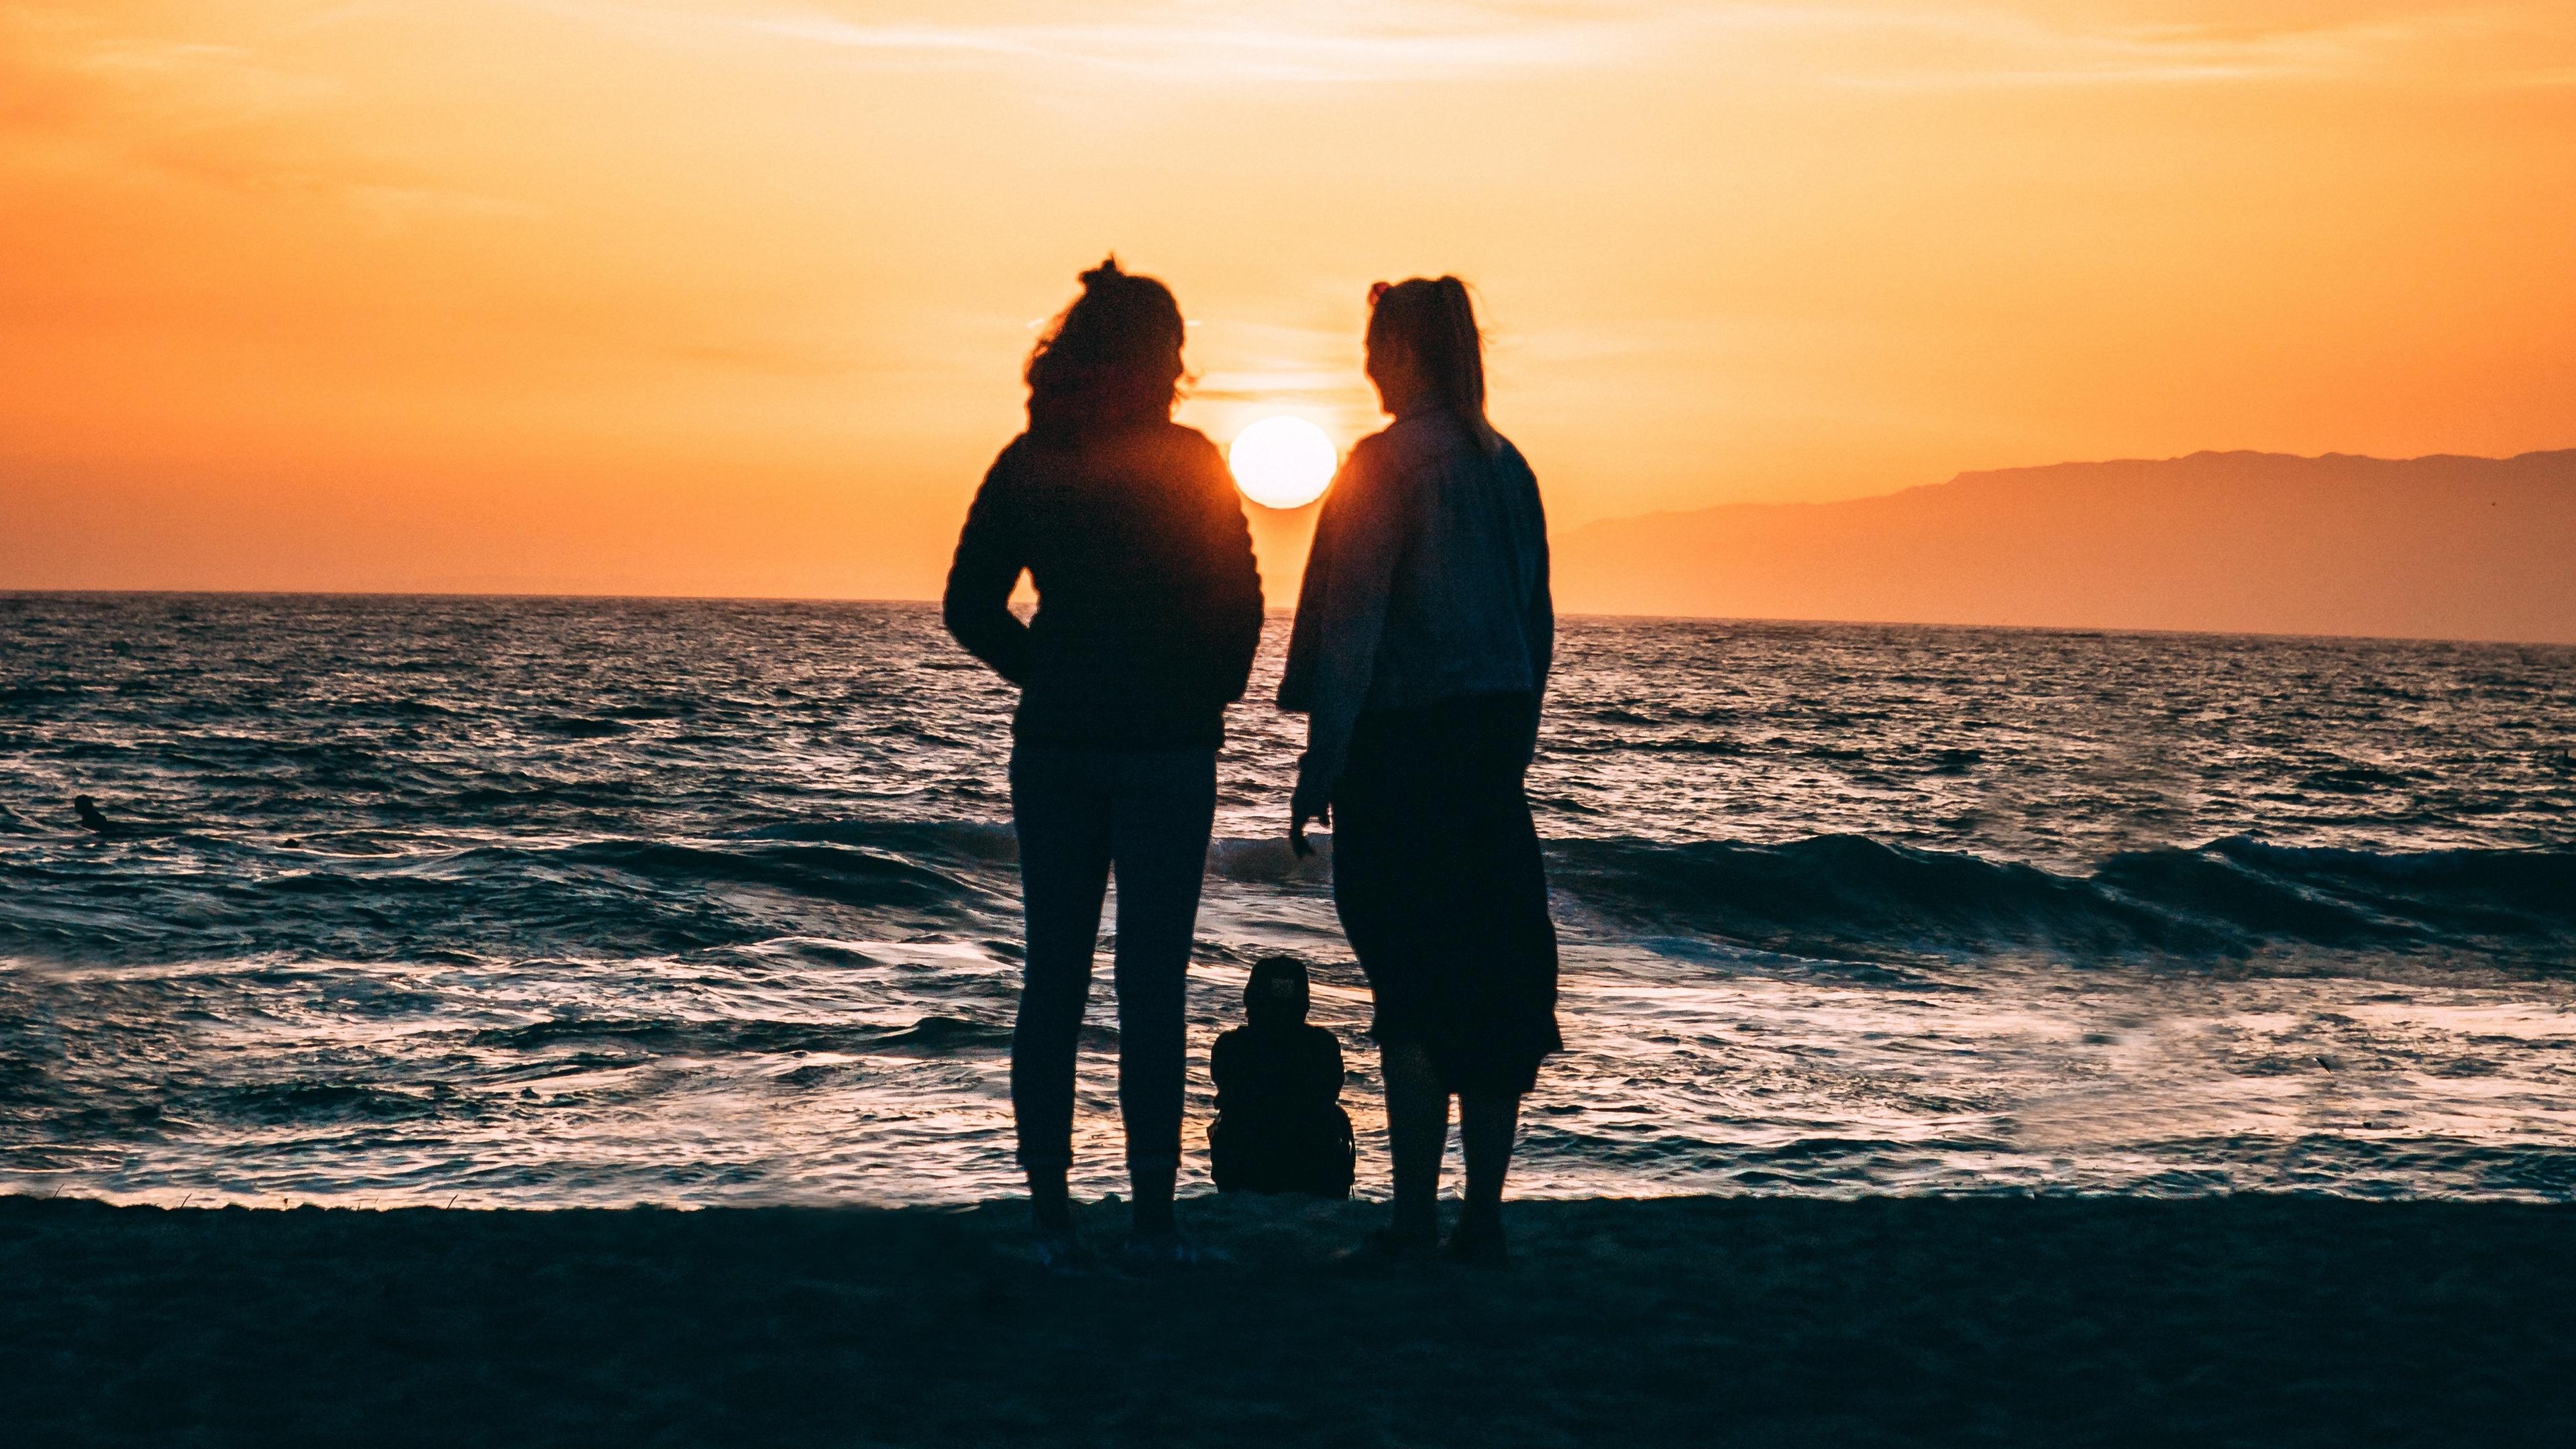 family silhouettes sea shore sunset 4k 1541115186 - family, silhouettes, sea, shore, sunset 4k - silhouettes, Sea, Family